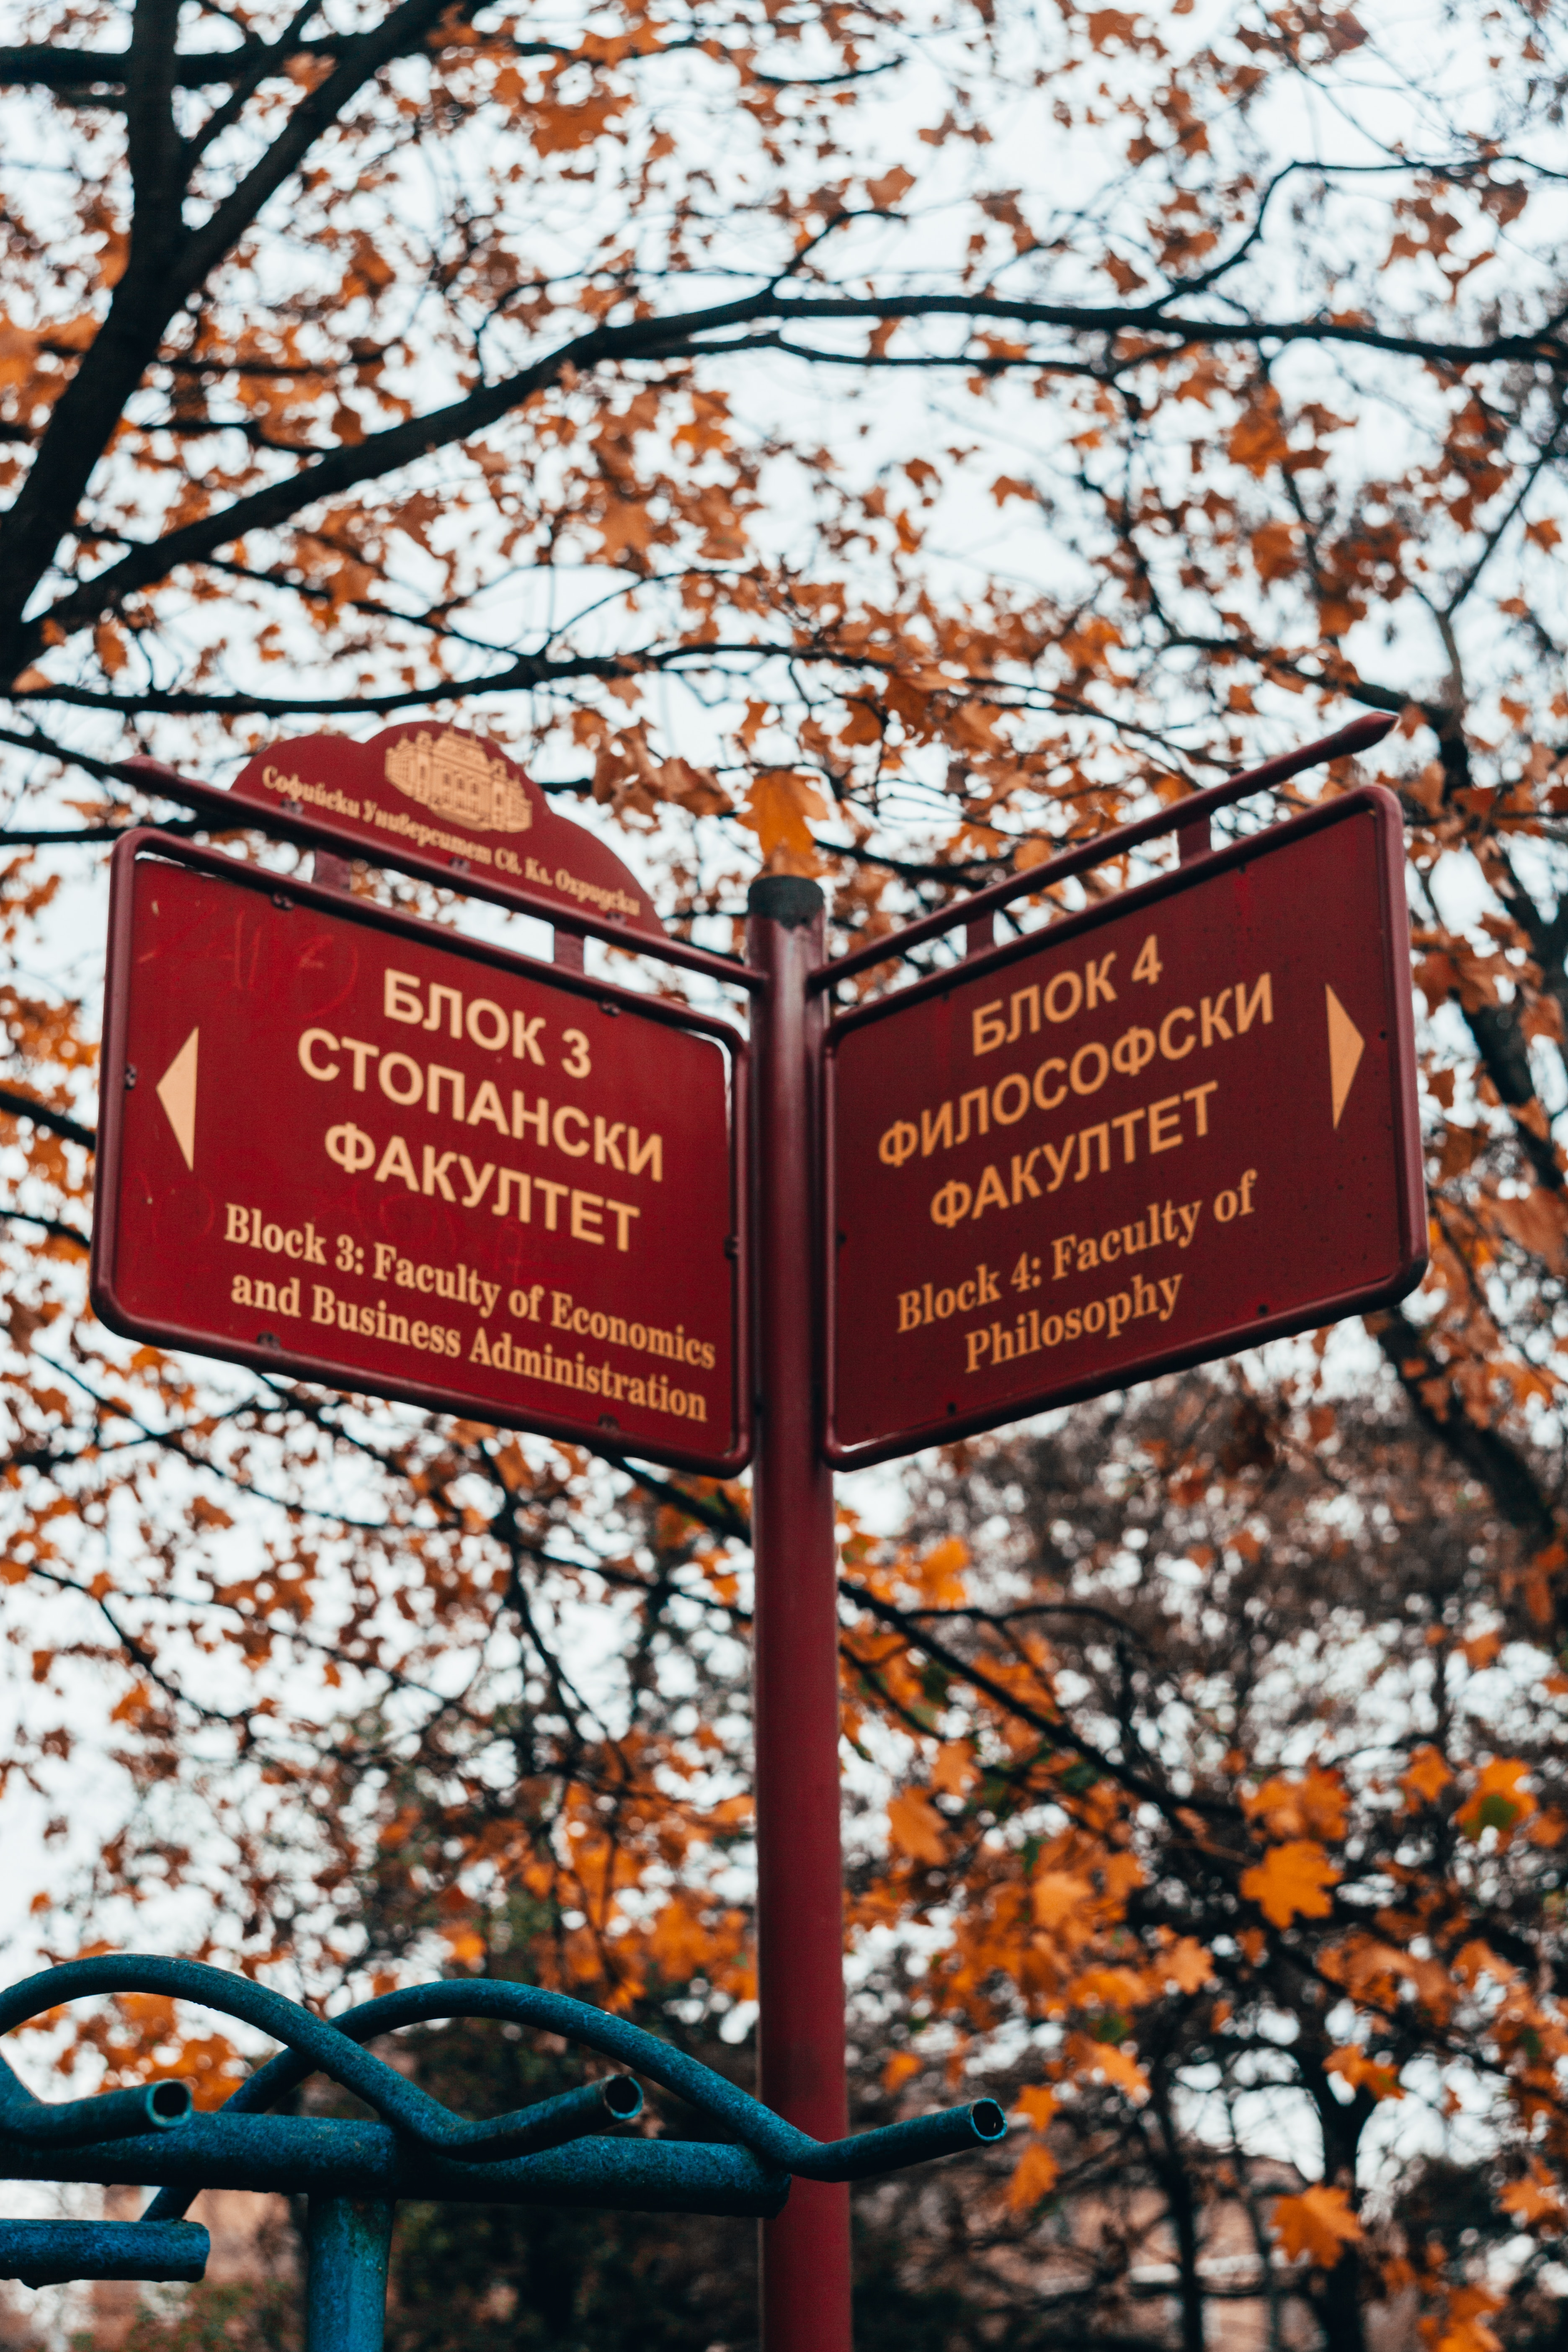 georgi-kyurpanov-sdudysyZ20w-unsplash